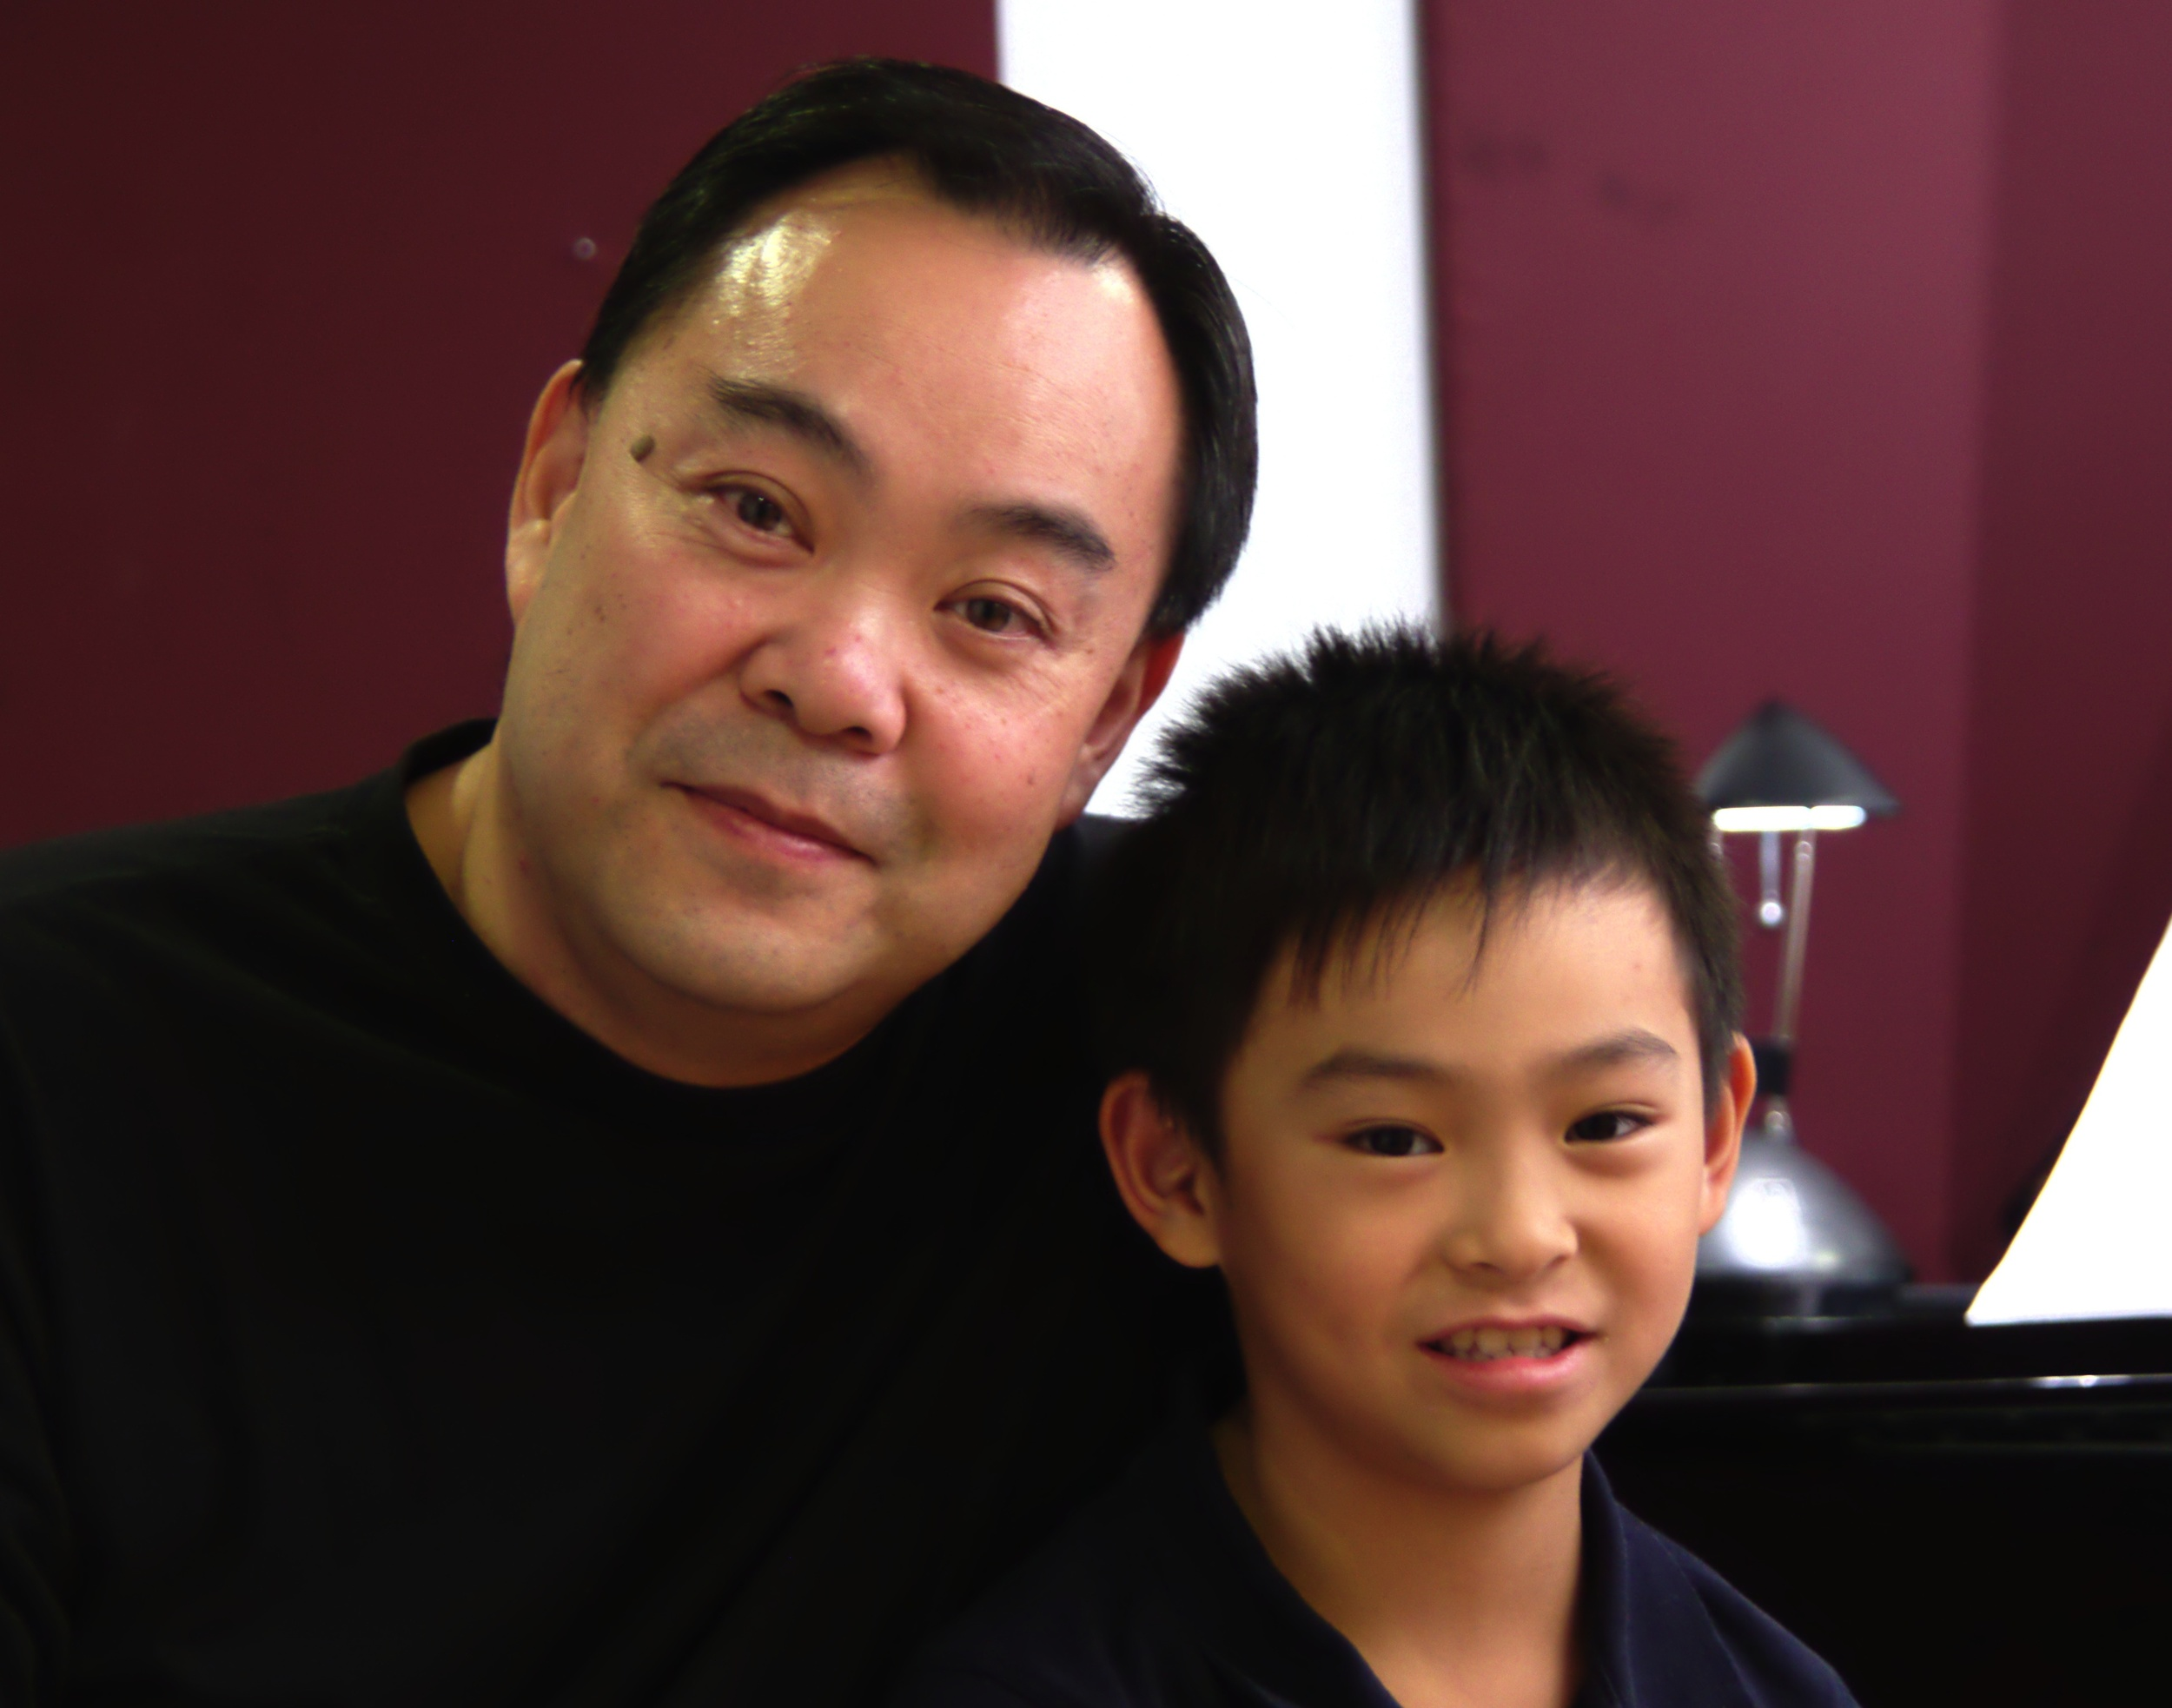 Hear what happy parents and students have to say 1, Chapman Piano Studio, NDG, Montreal. Photo credit. Yuuki Omori 2014.